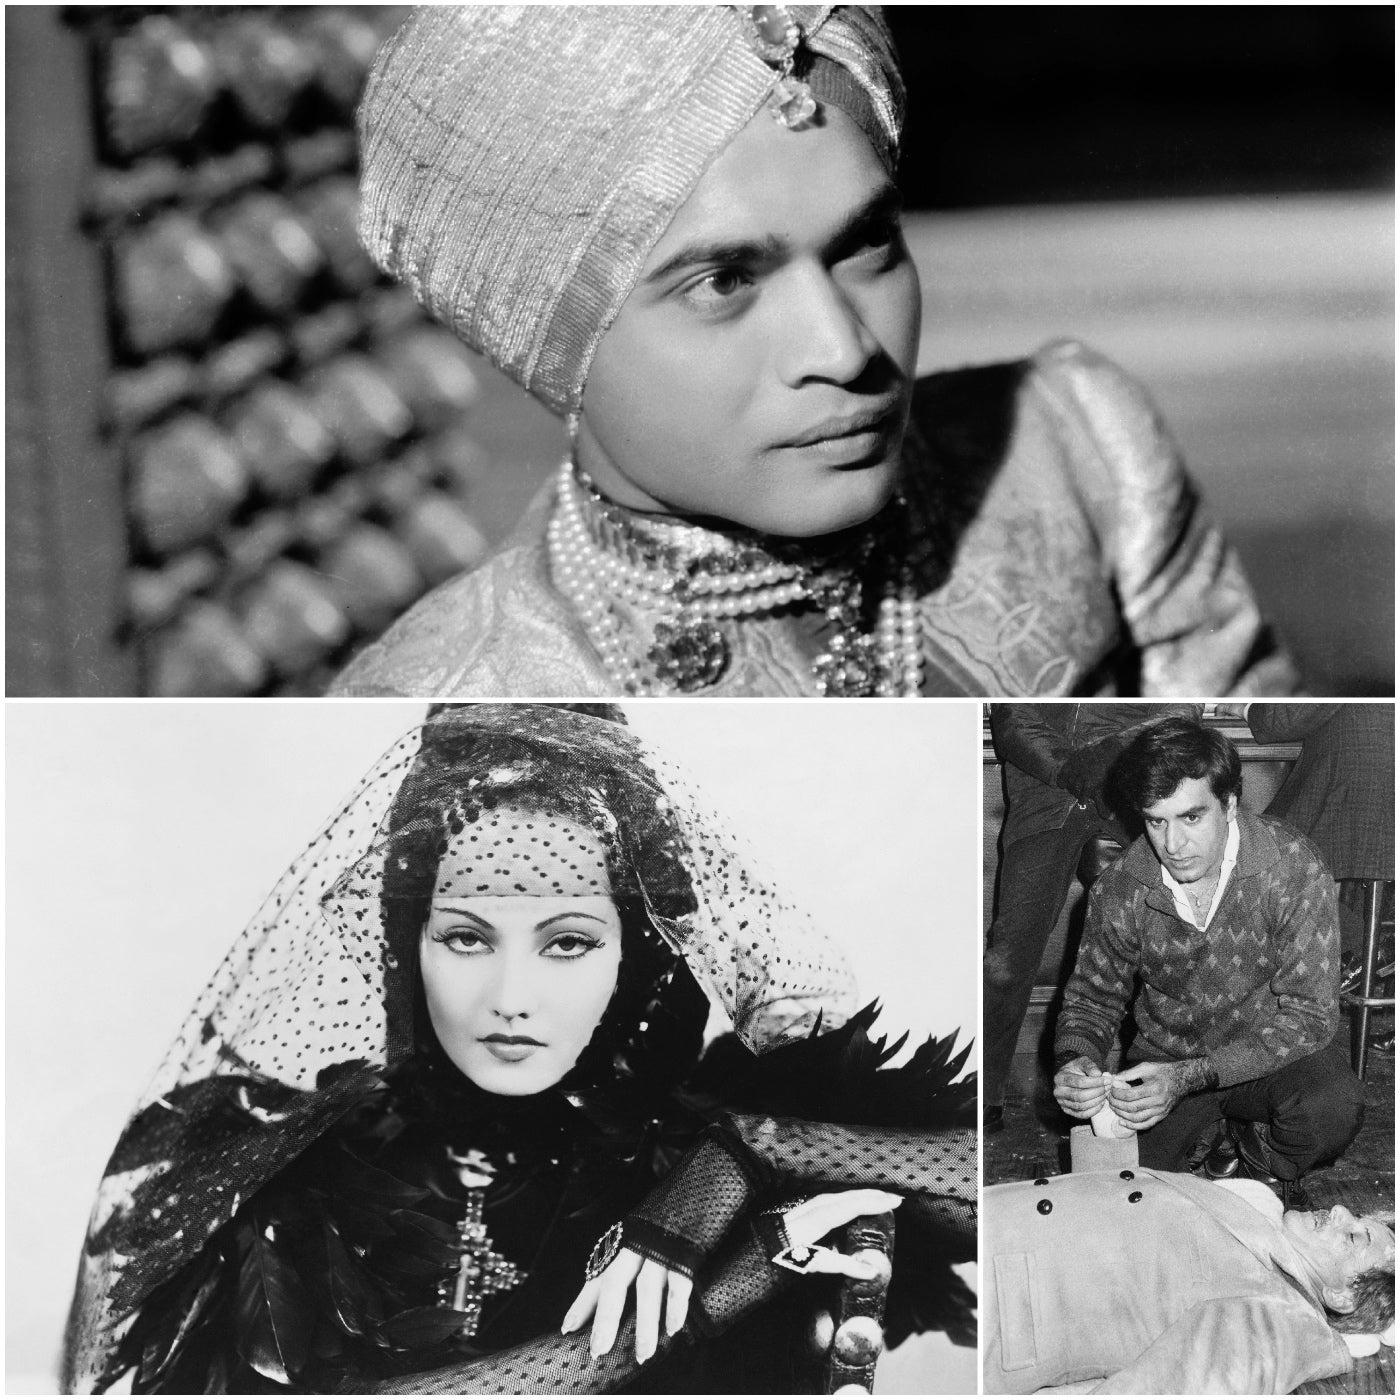 Actors Sabu, Merle Oberon and Kavi Raz